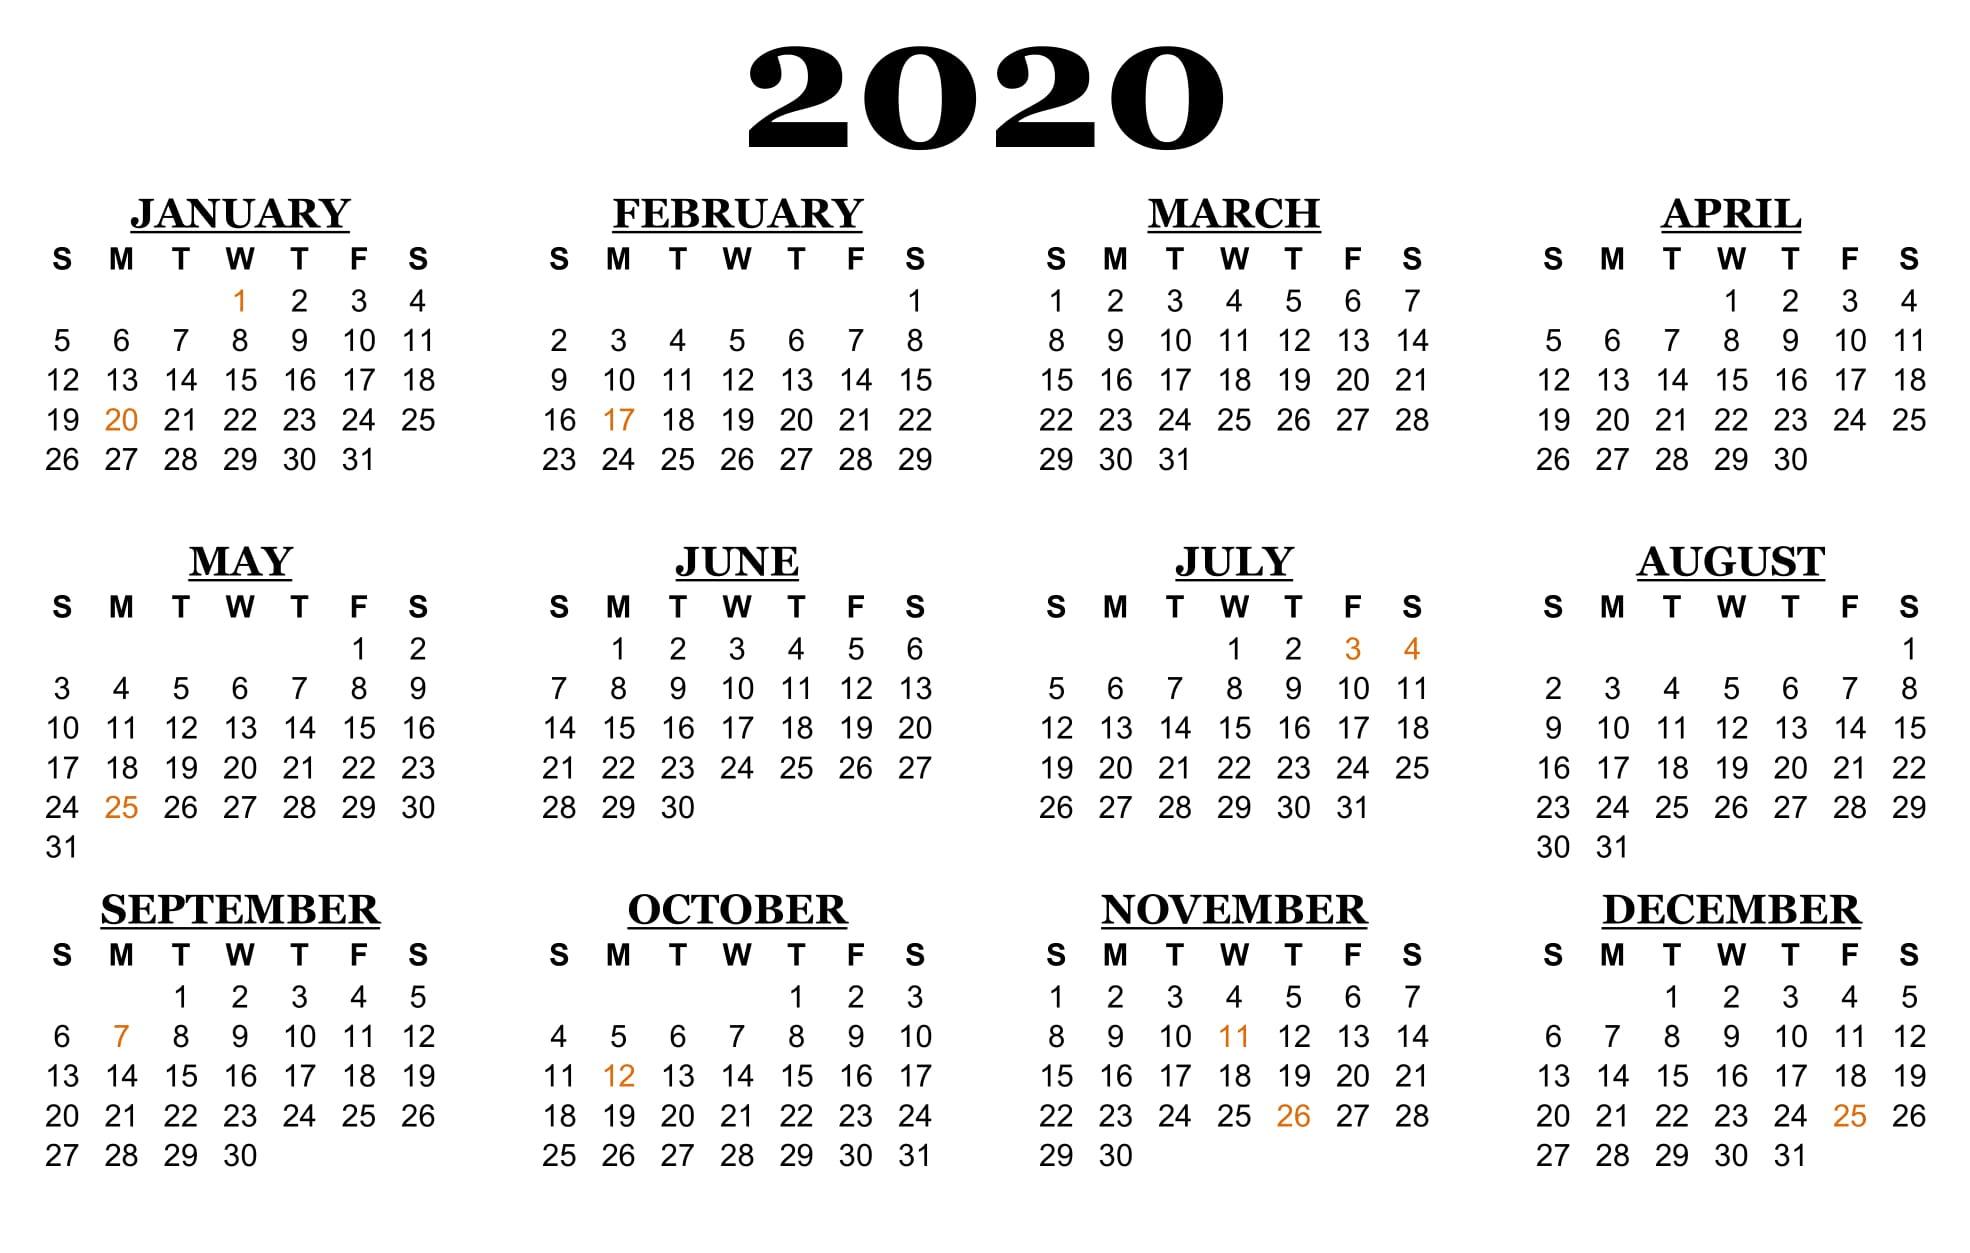 Simon Gipps Kent ⁓ Top 10 Public Holidays Australia Qld 2020